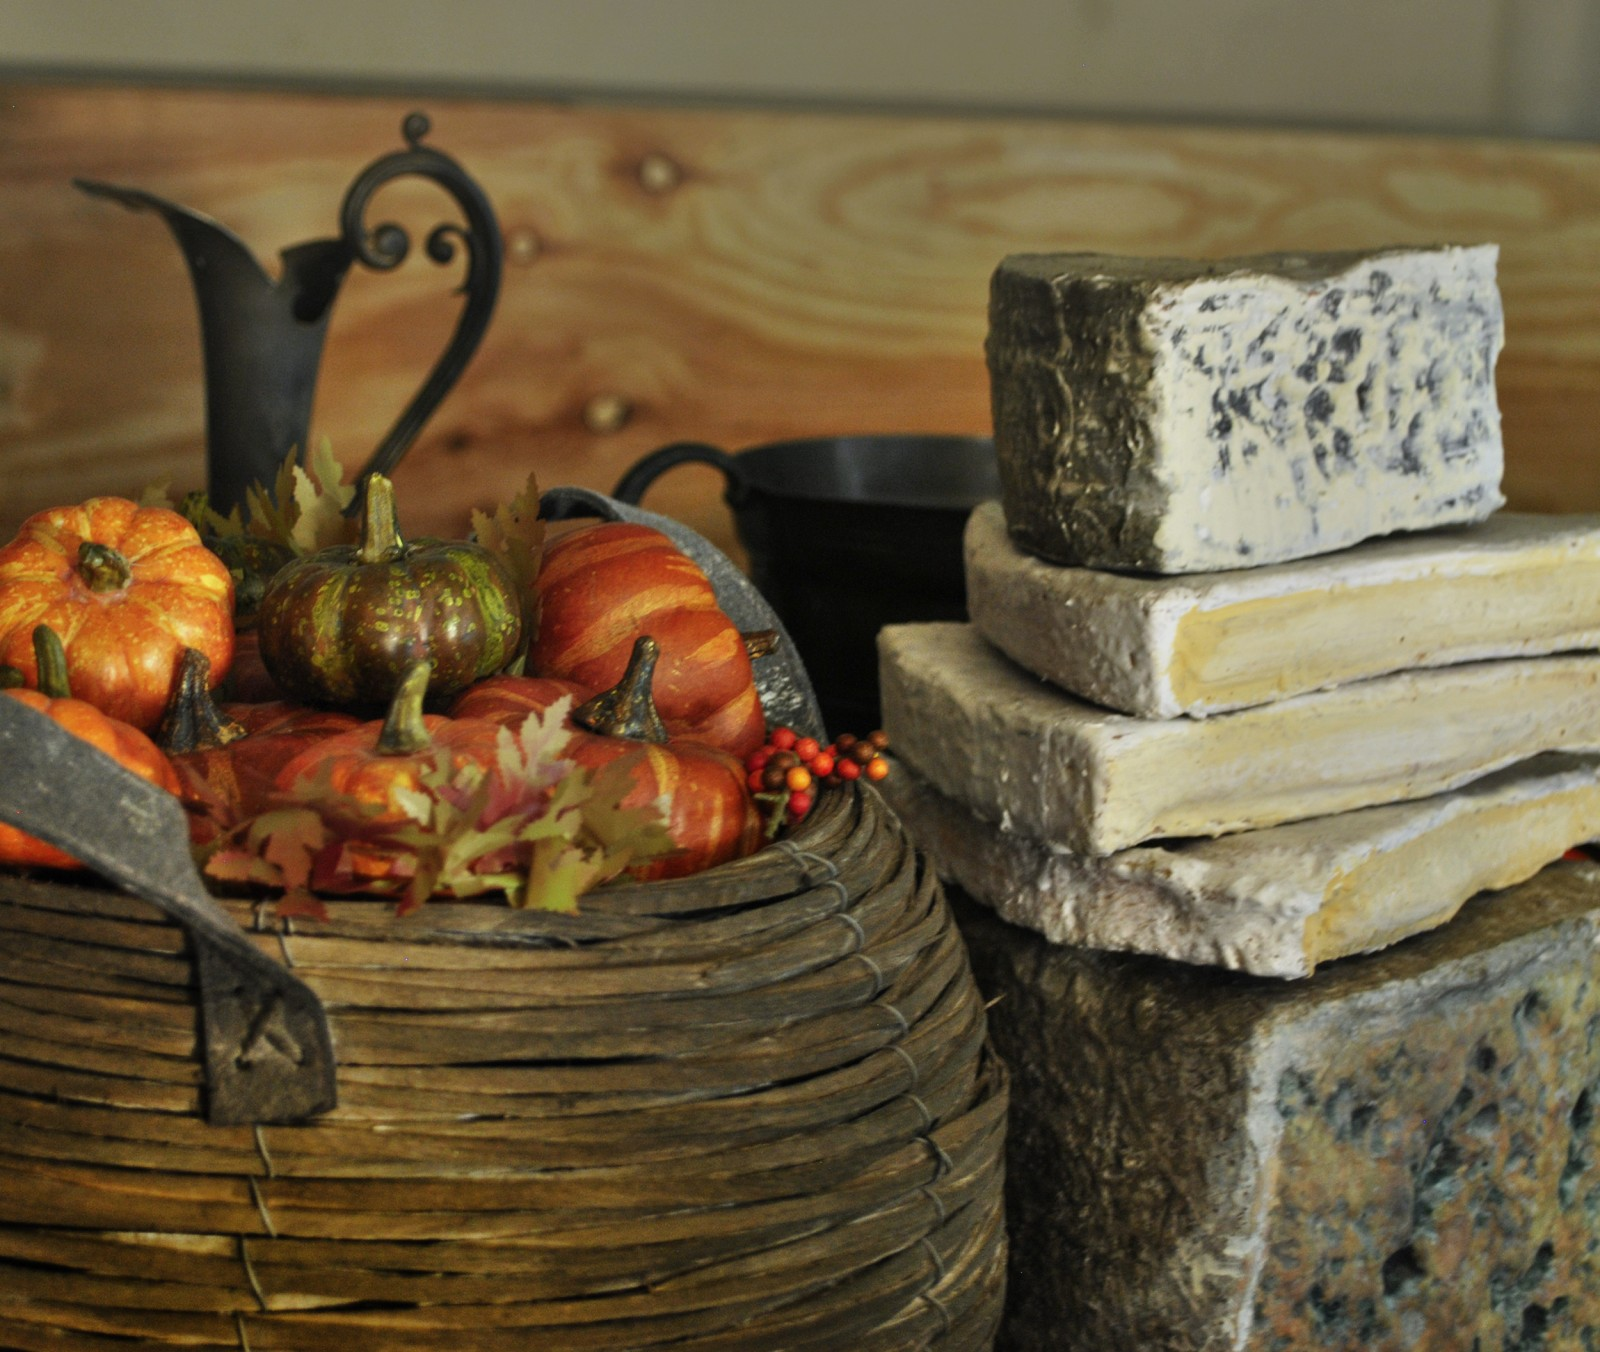 photo accessoires banquet roi arthur corbeille fromage